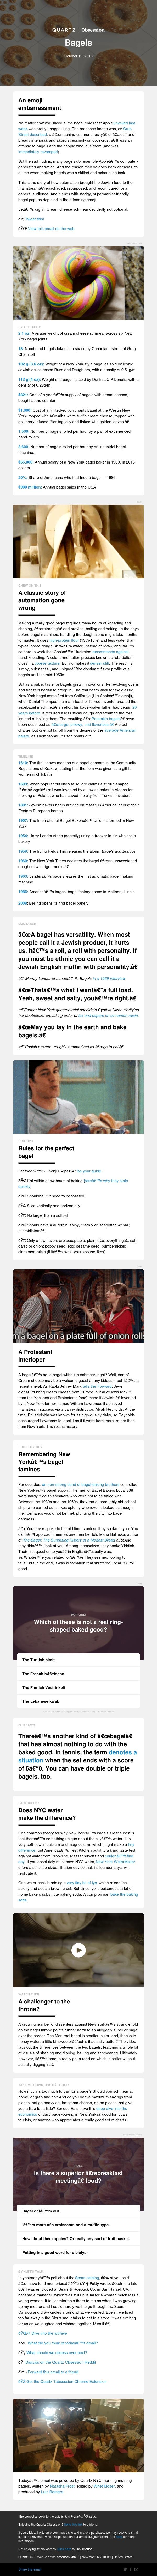 Bagels: The holeyest baked good